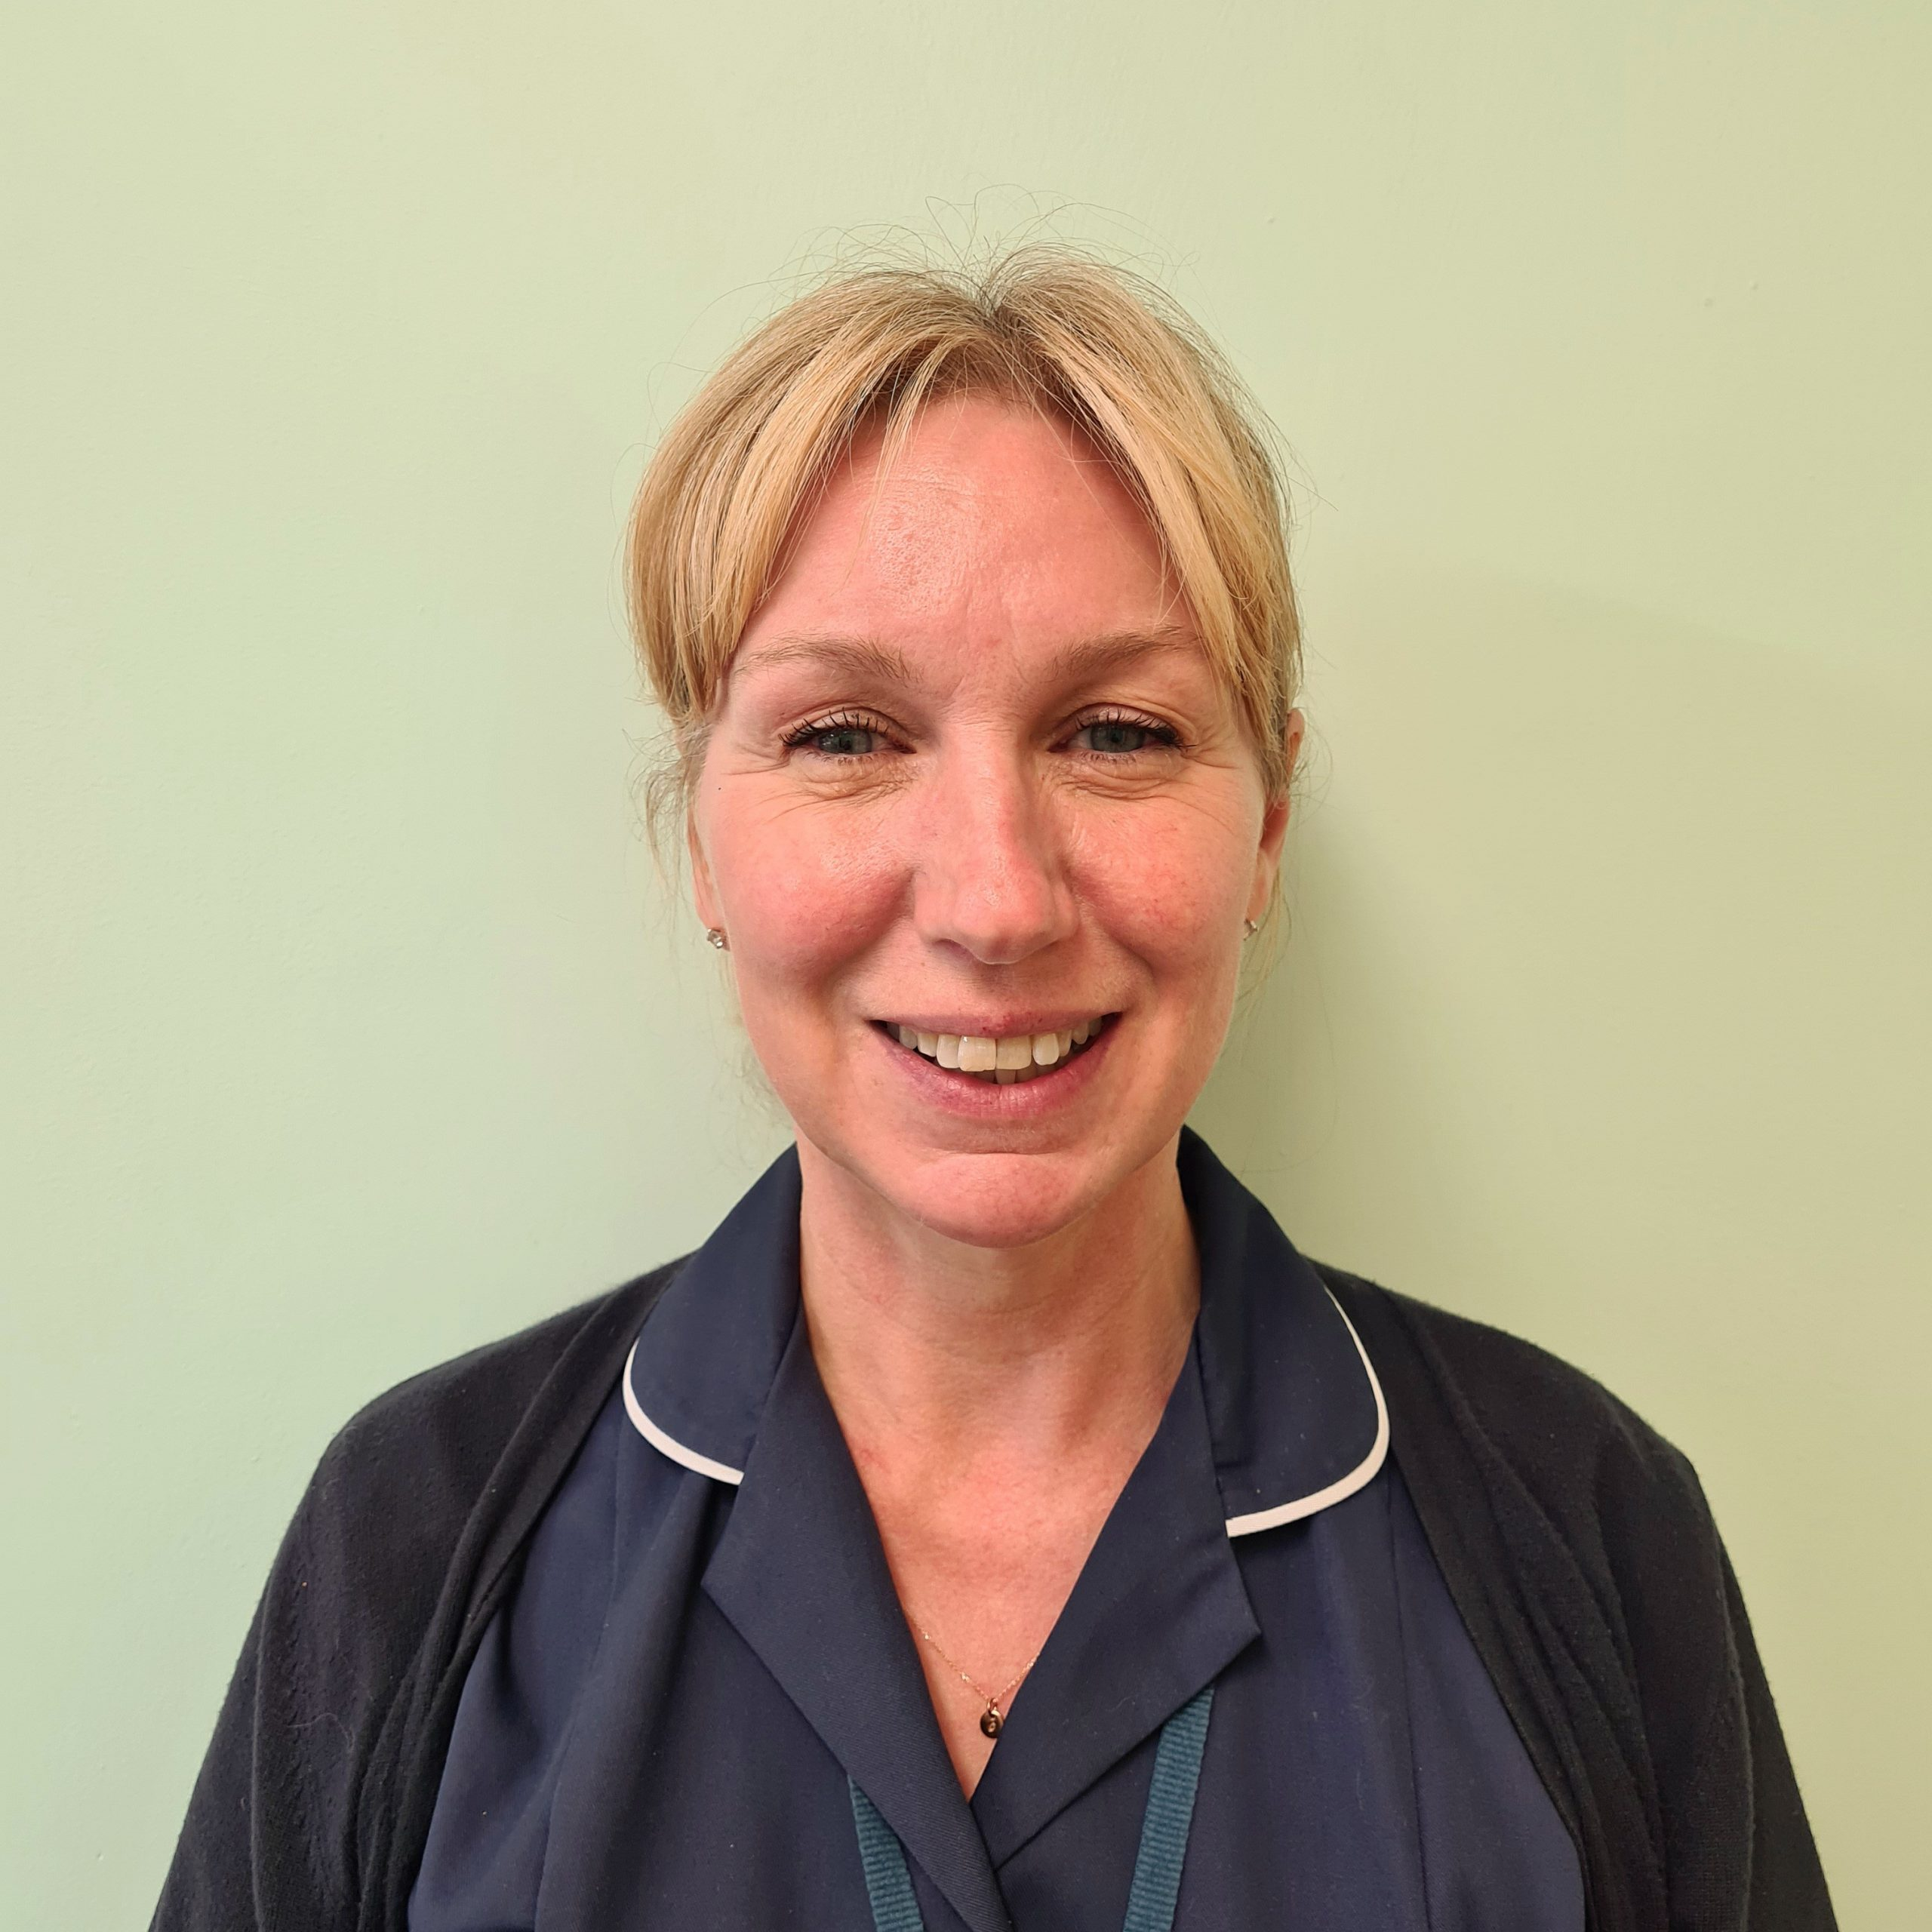 Practice and Outreach Nurse Kate Hazell